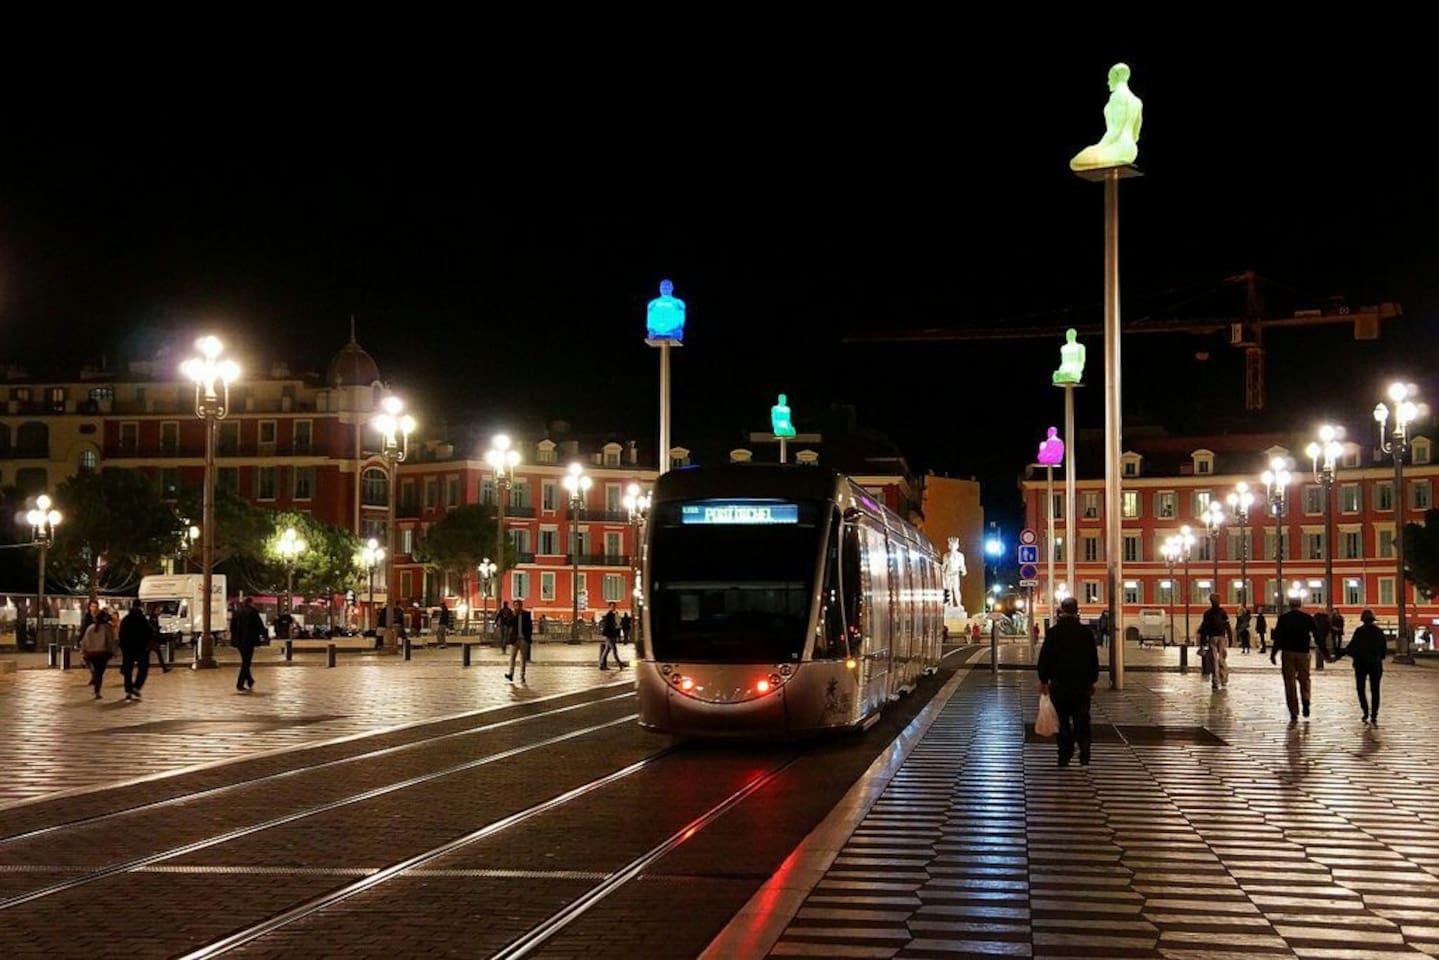 A 1 minute du tramway